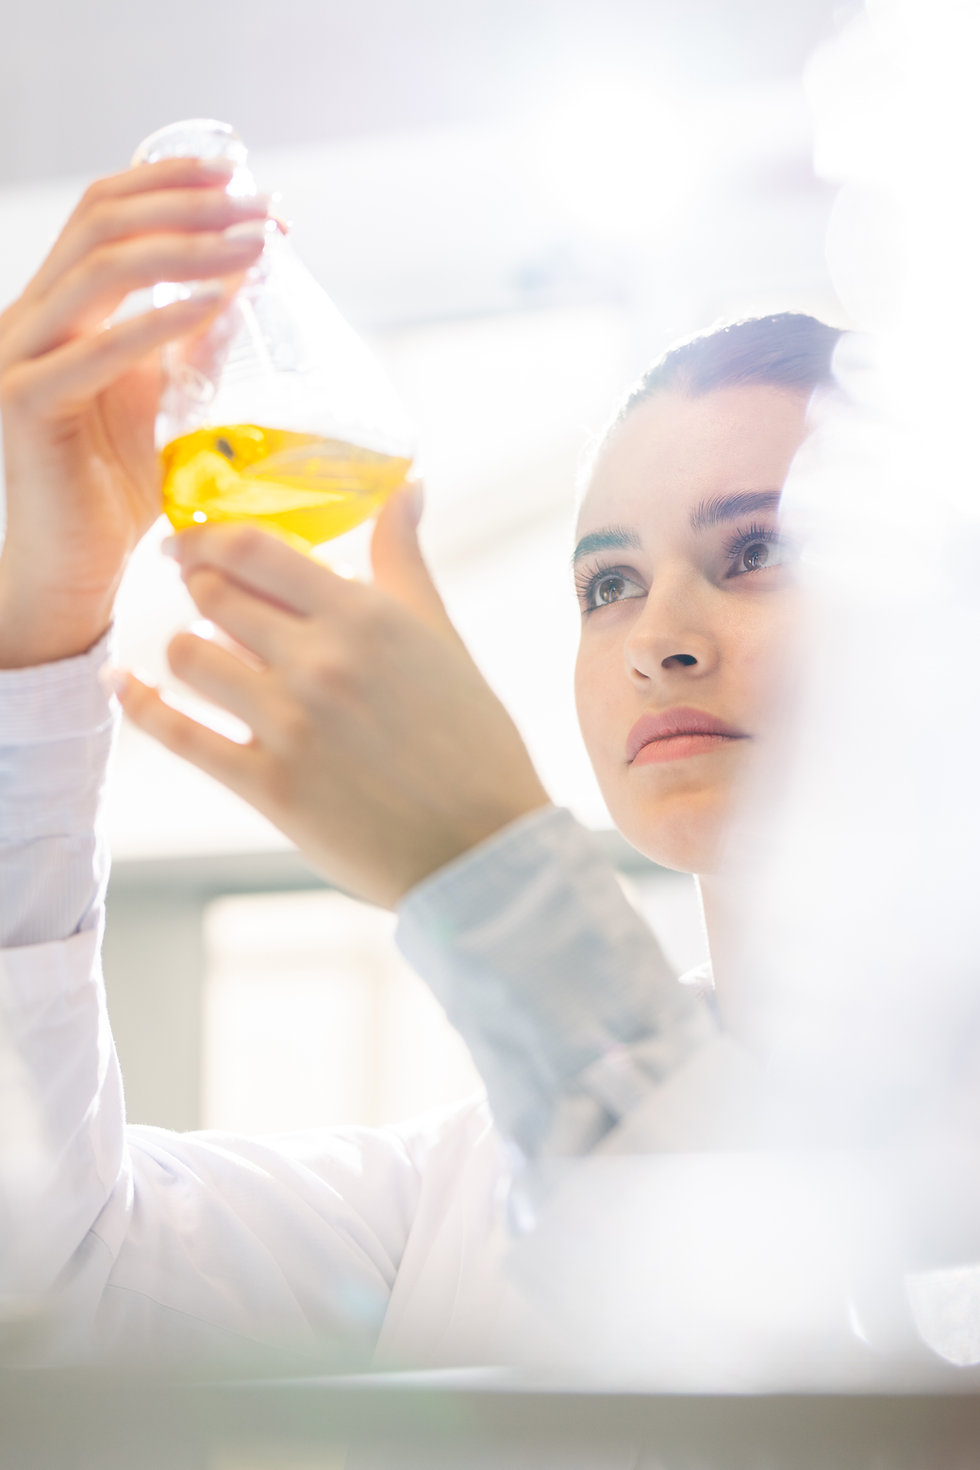 Female APRC scientist inspecting sample